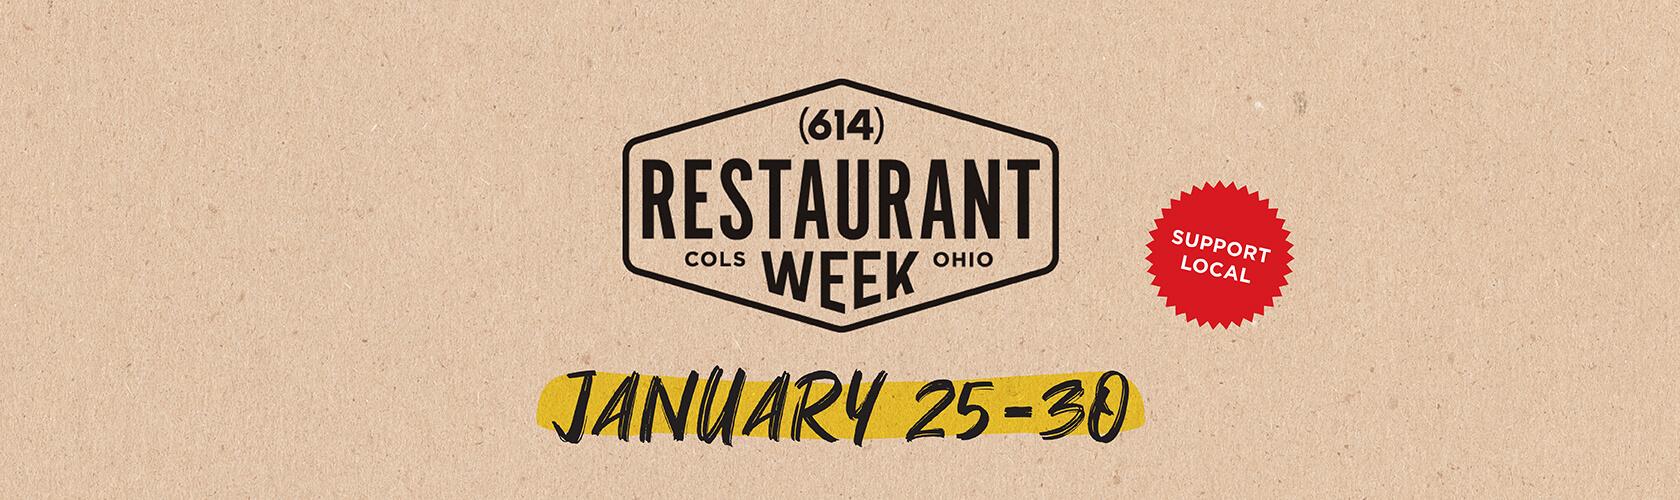 (614) Restaurant Week January 25-30, 2021.